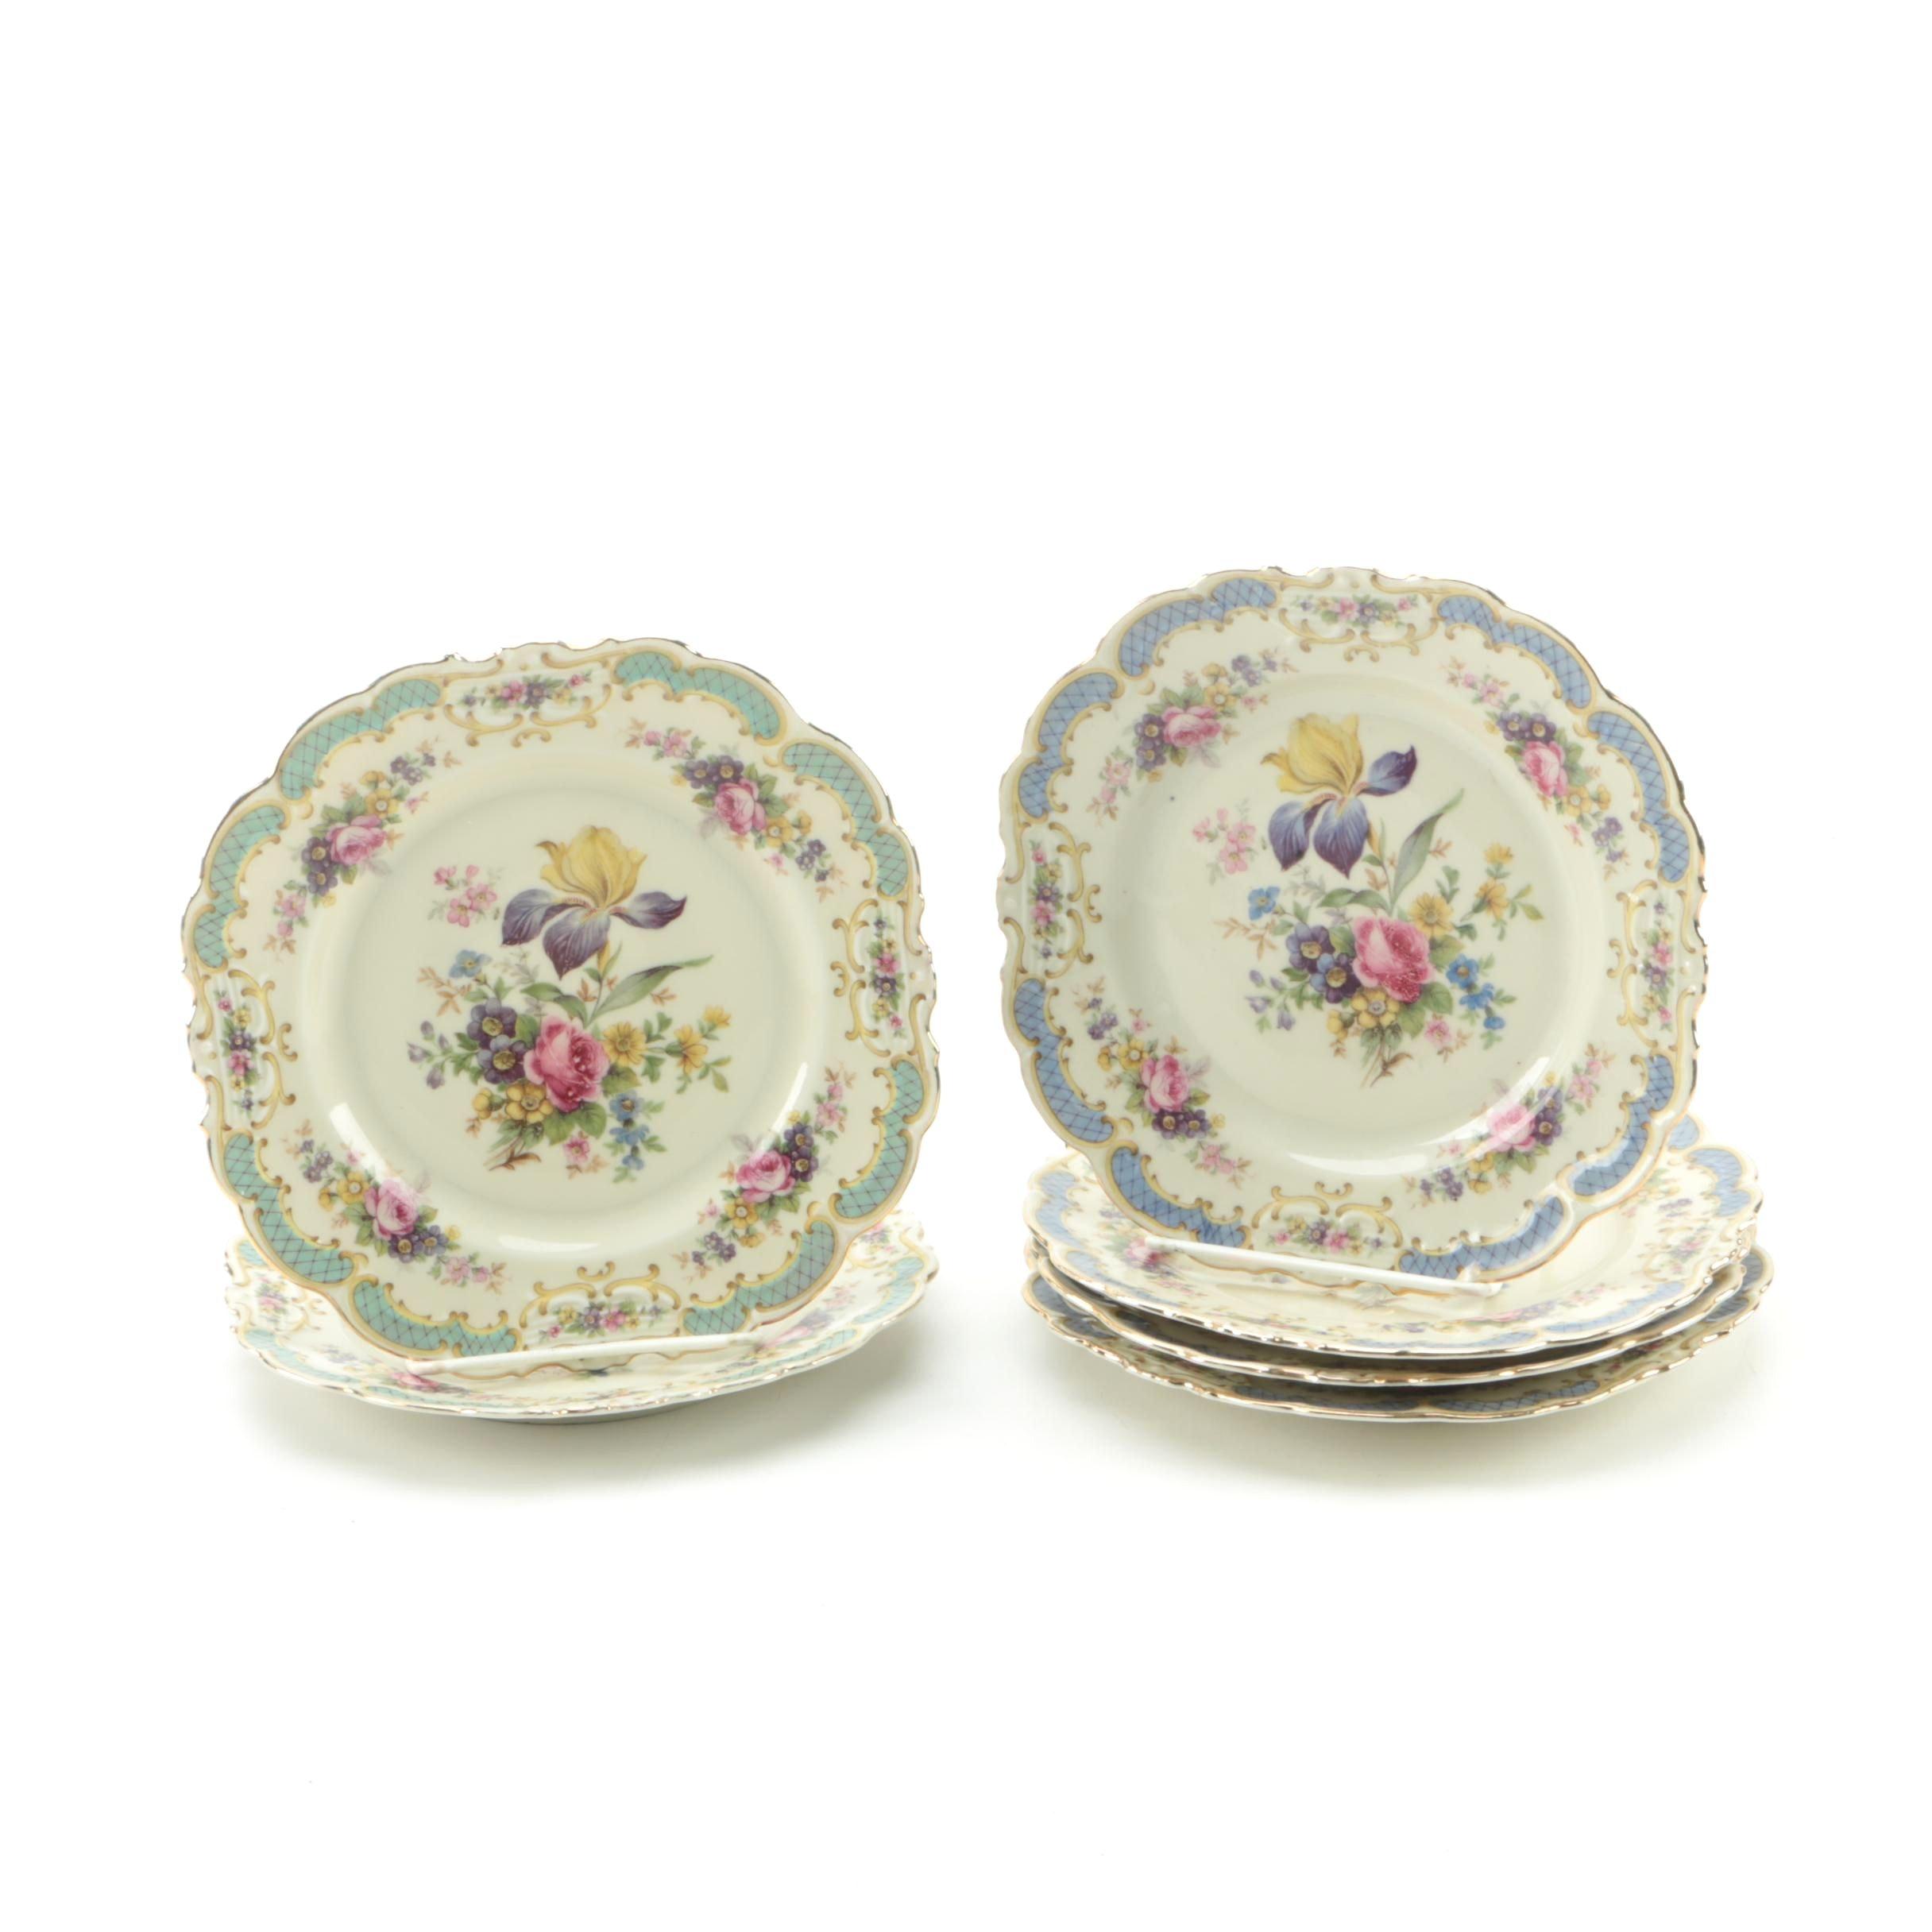 1945-49 Schwarzenhammer Porcelain Bread Plates